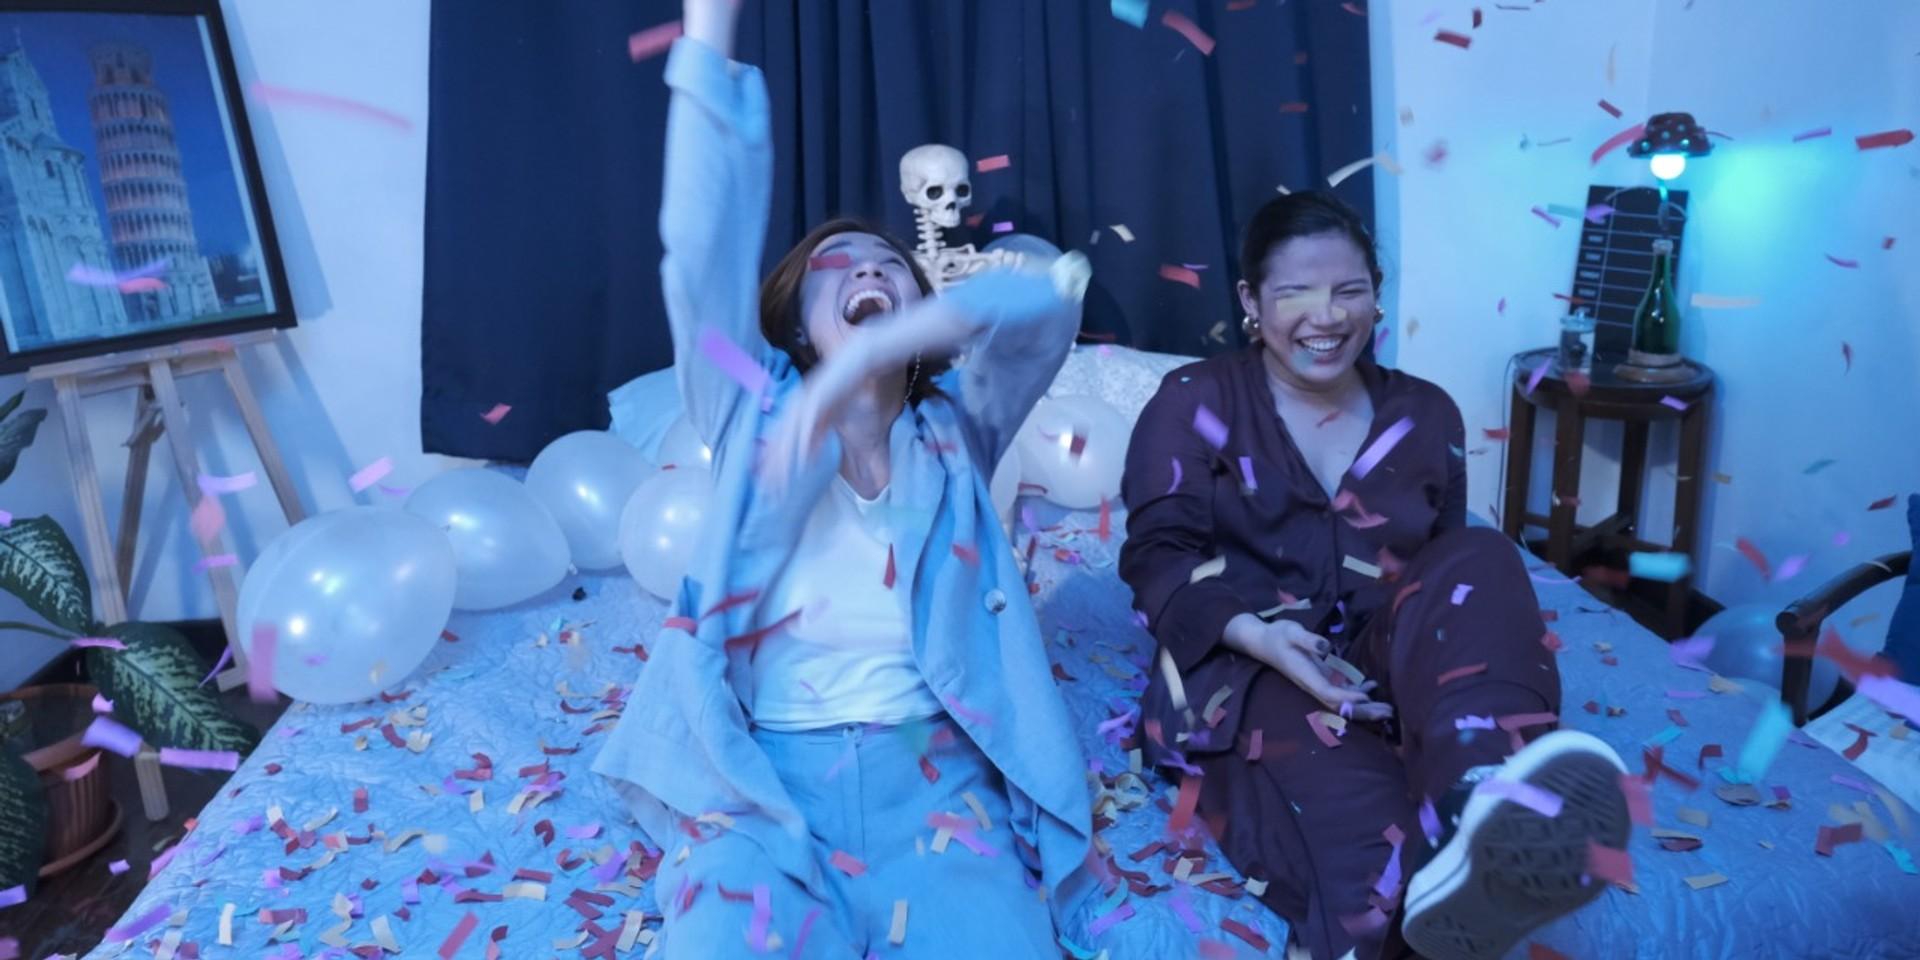 Behind the Lens: MV Isip on directing Leanne & Naara's 'Keeping Me Up' music video